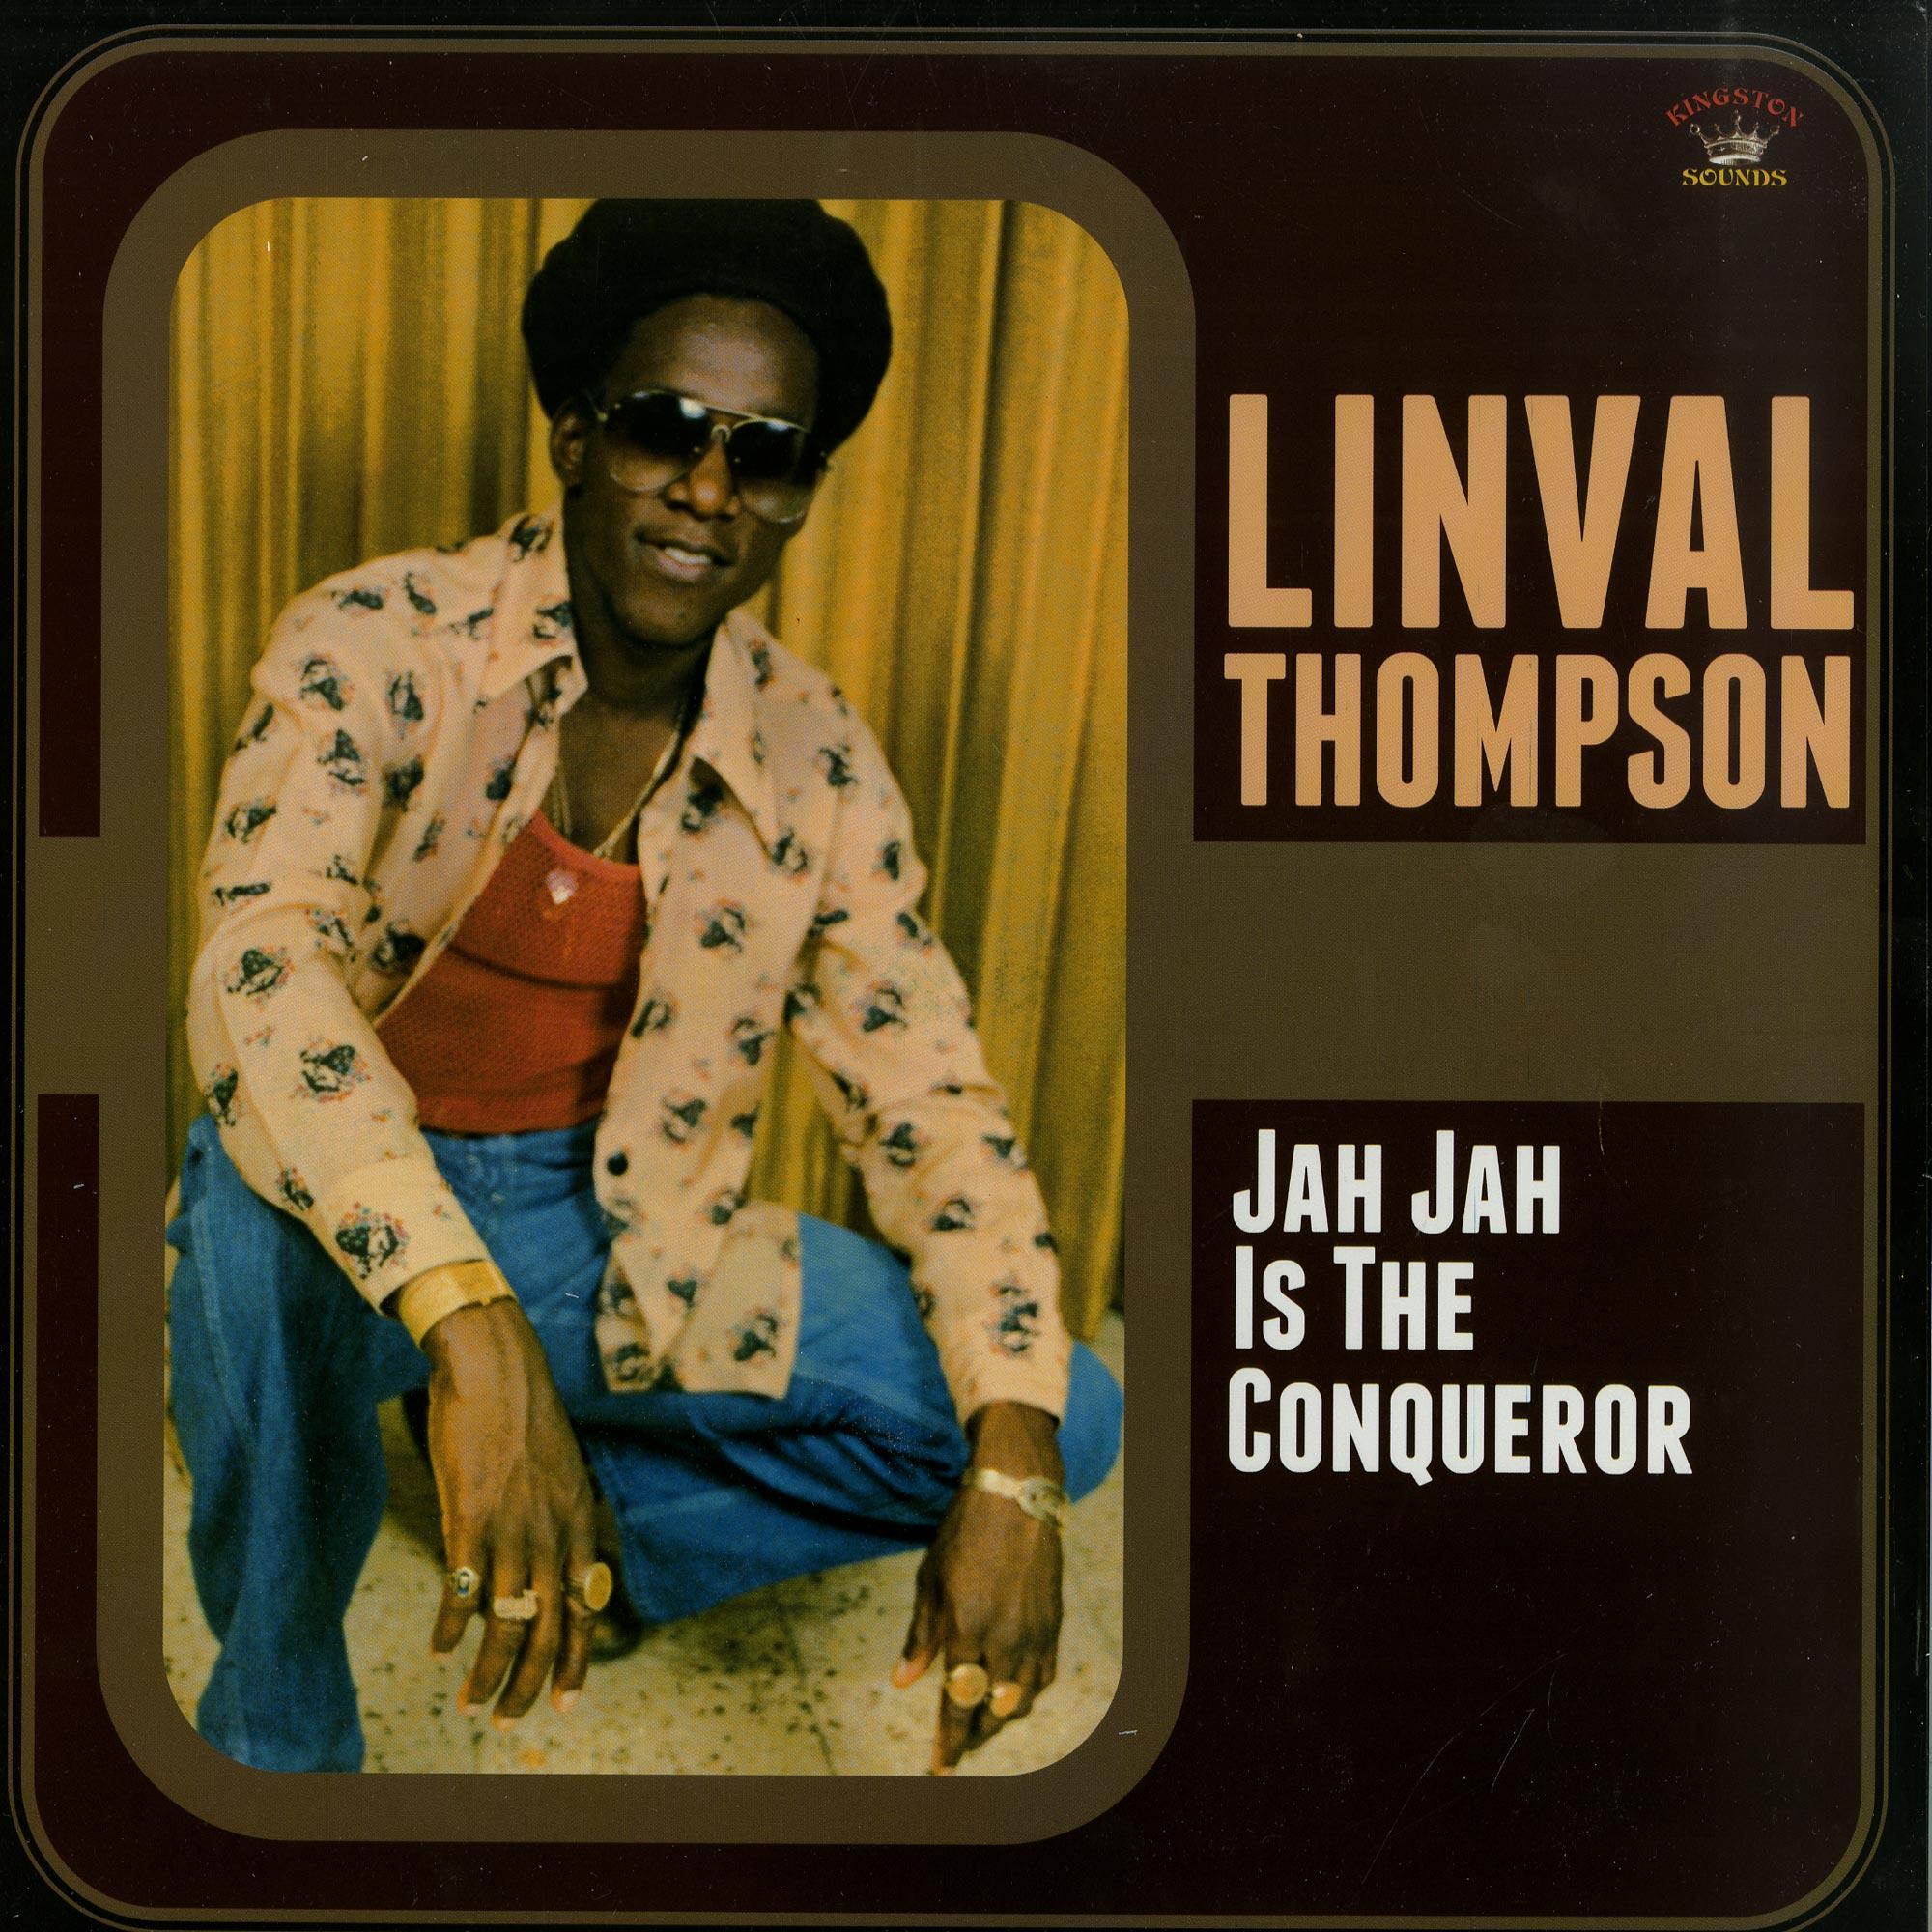 Linval Thompson - JAH JAH IS THE CONQUEROR